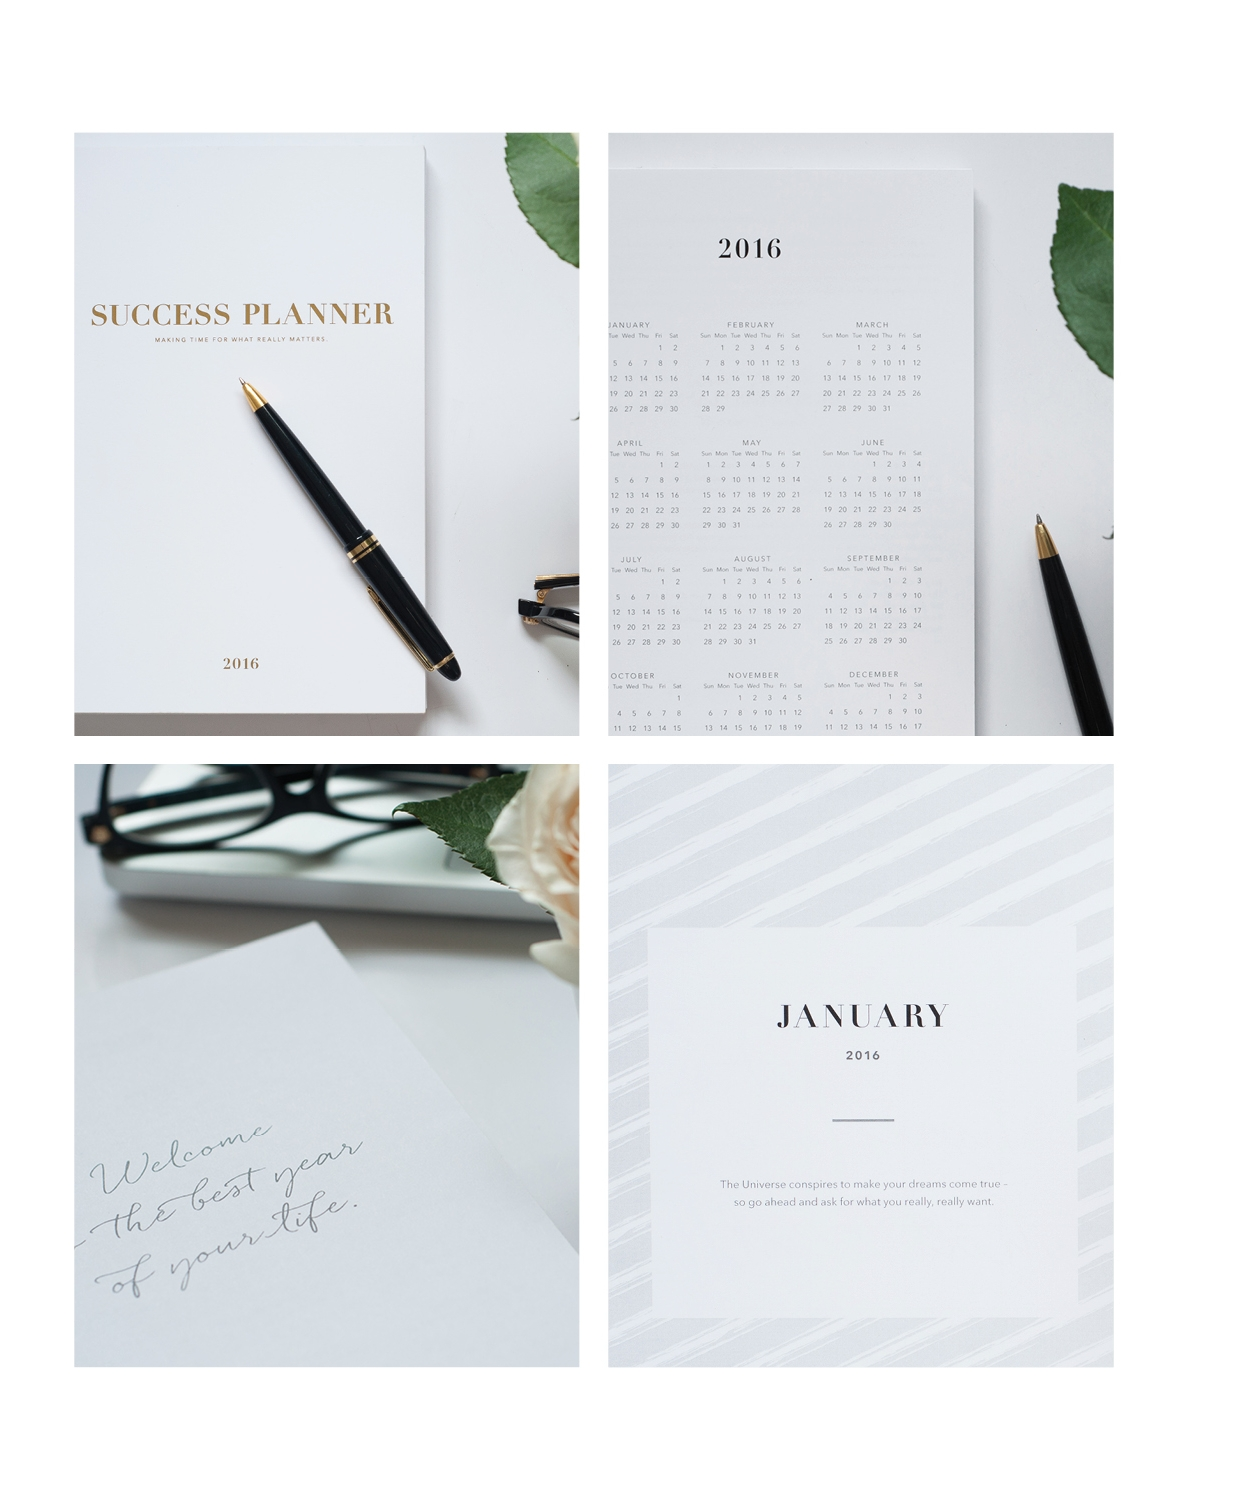 Copywriting of a calendar year, Success Planner.